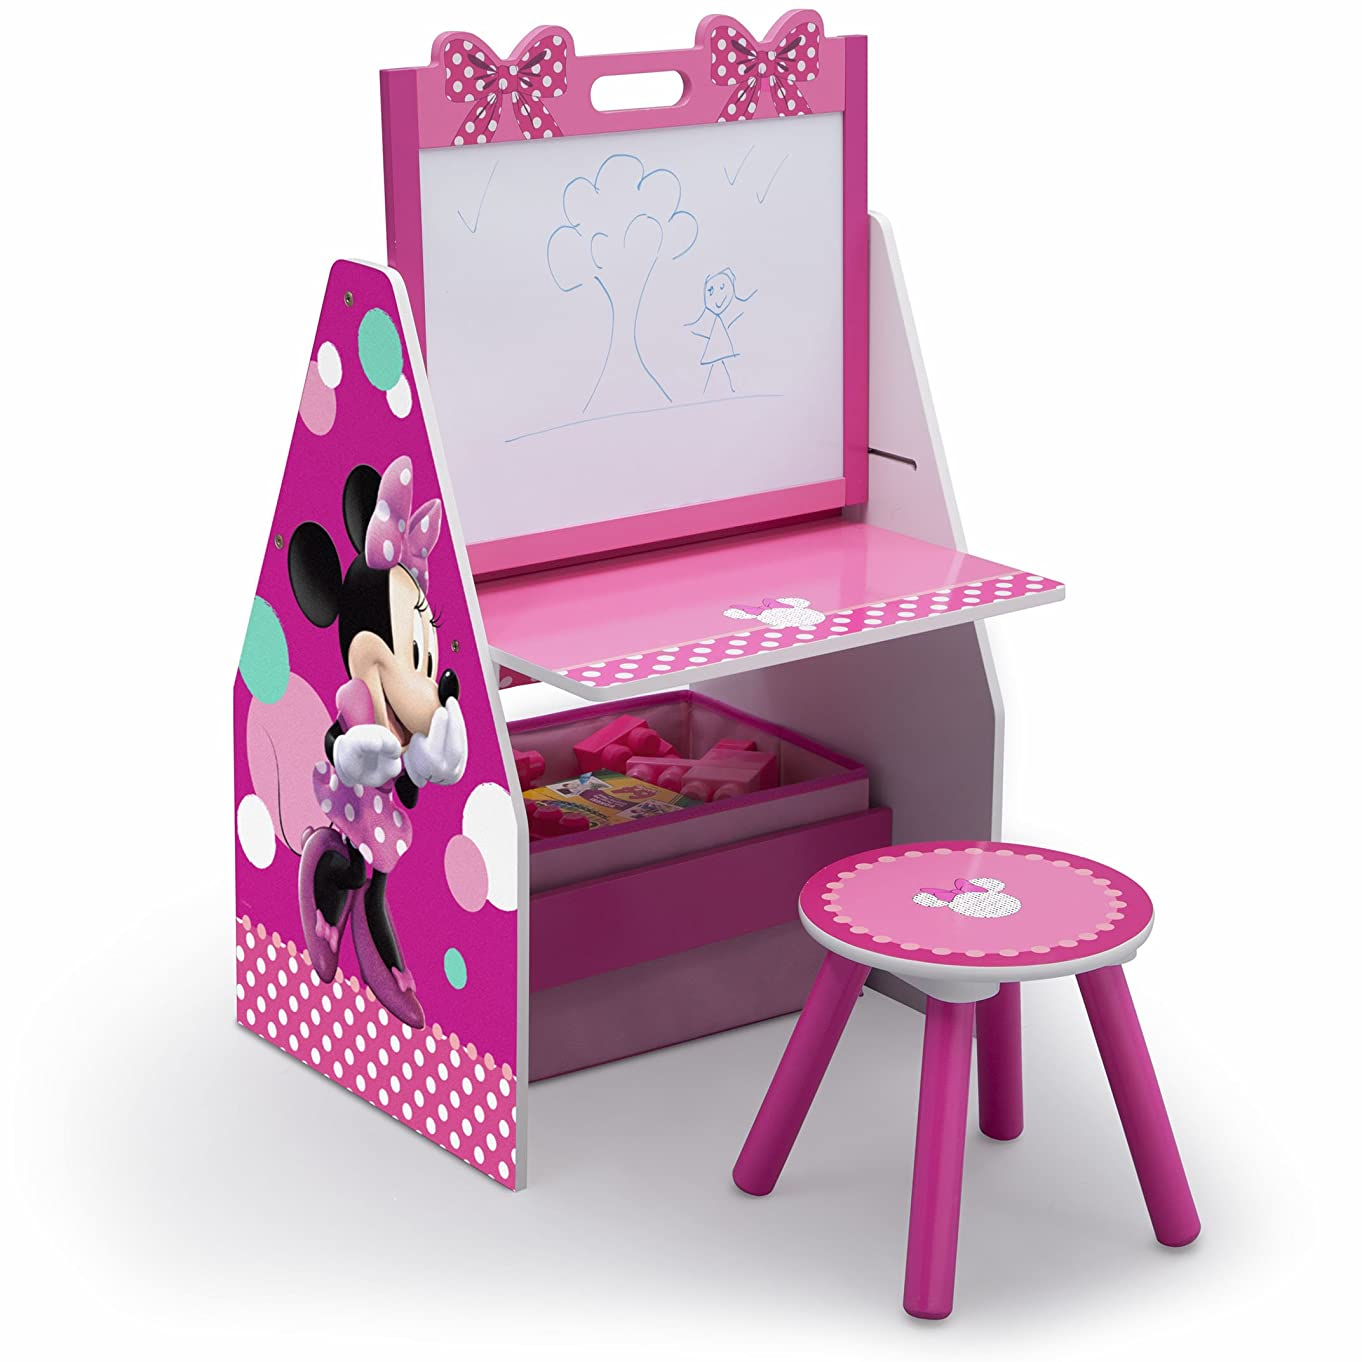 Delta Children Deluxe Kids Art Easel Desk Stool Toy Table Organizer, Disney Minnie Mouse